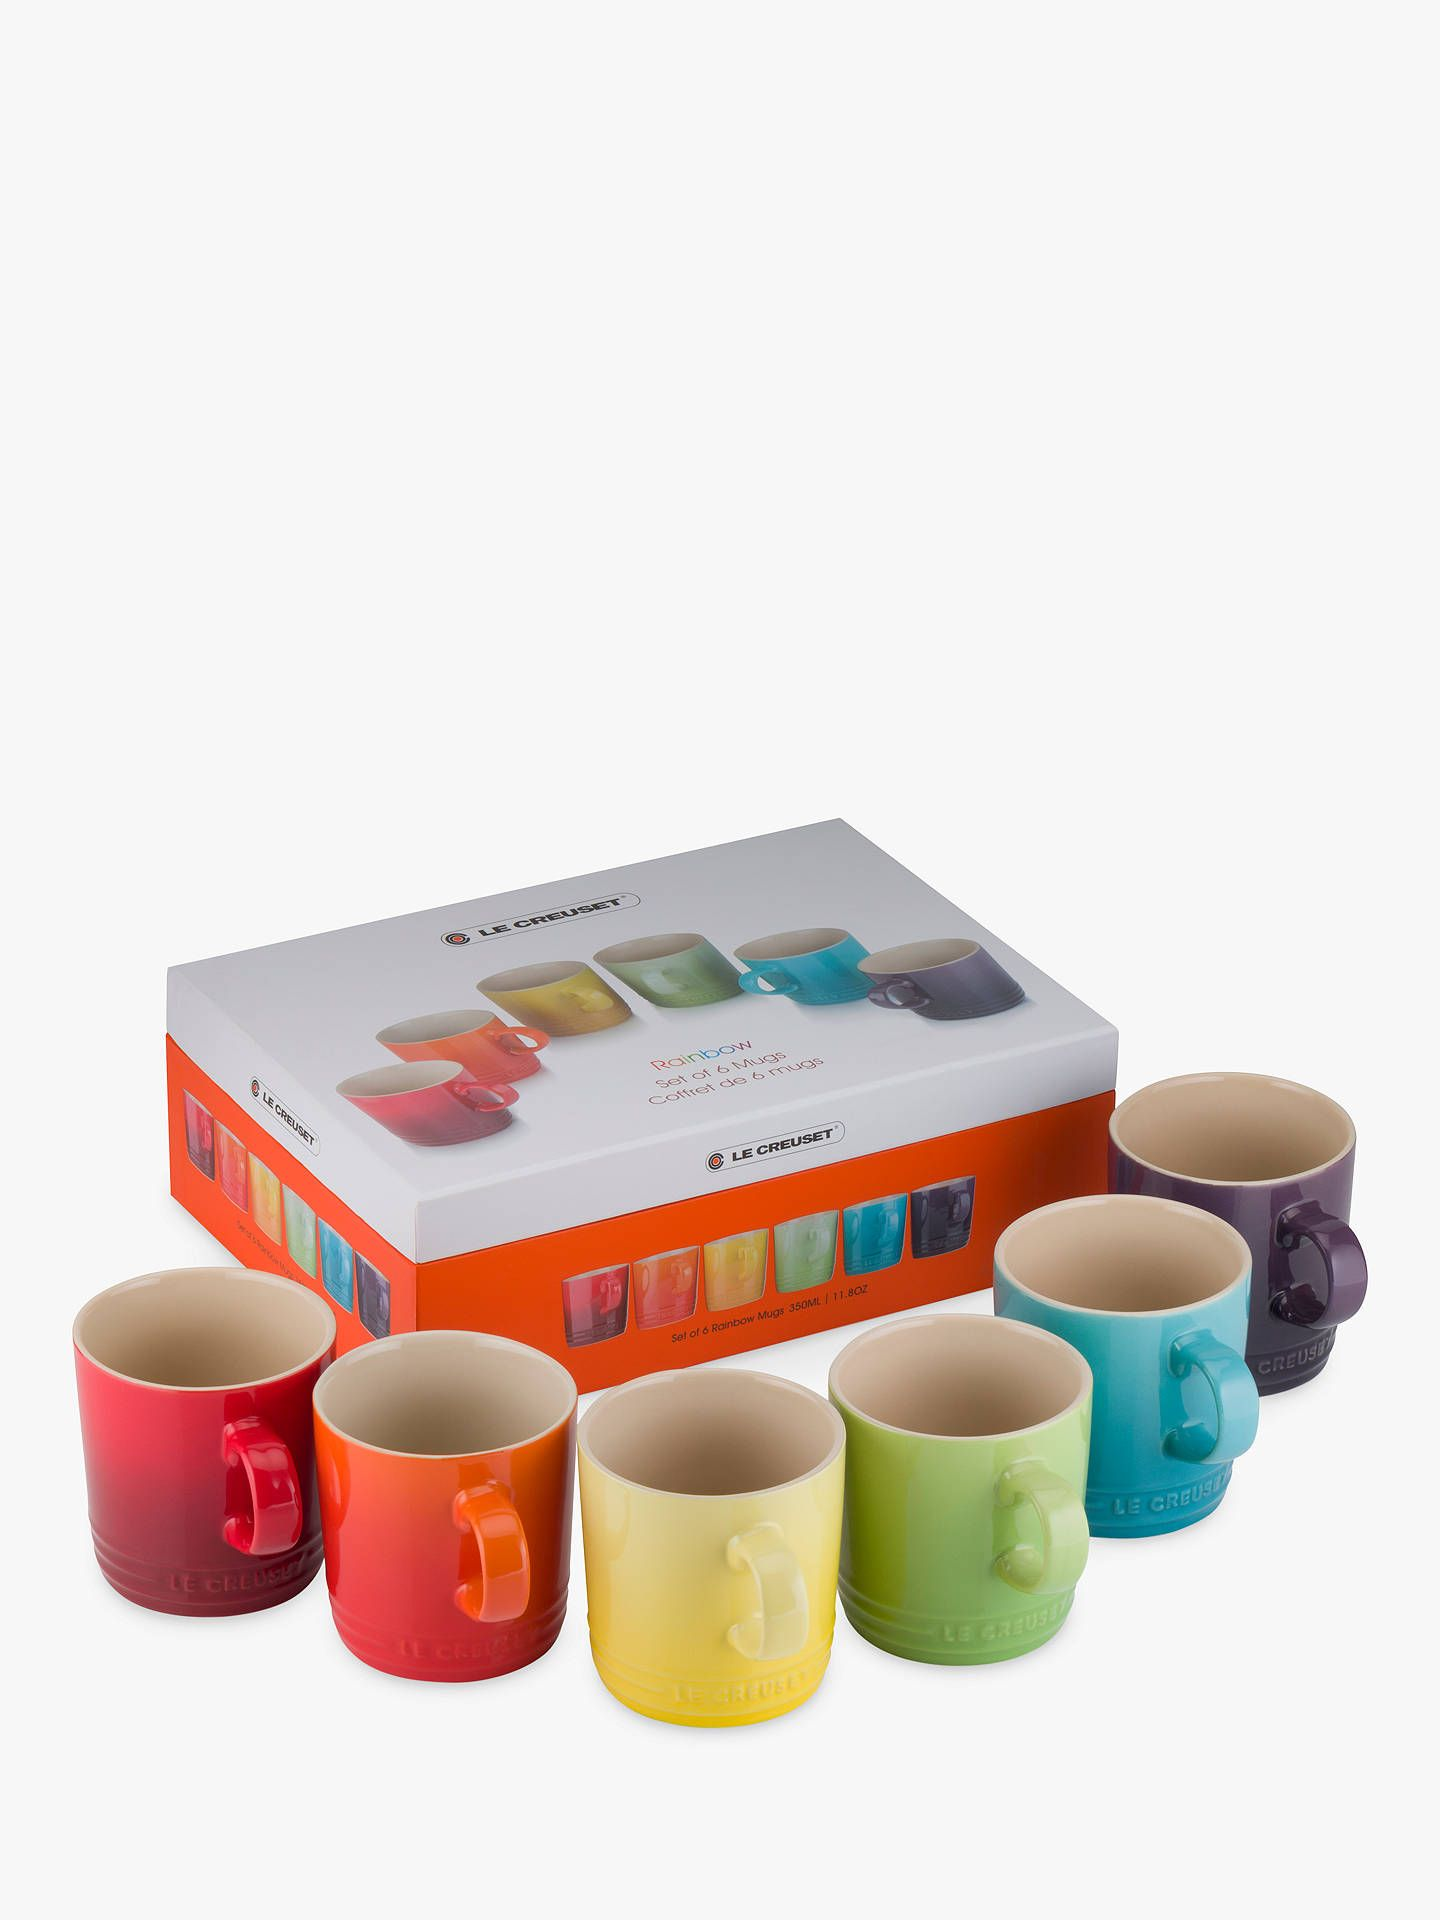 Le Creuset Stoneware Rainbow Mugs 350ml Set Of 6 Assorted Le Creuset Stoneware Mugs Stoneware